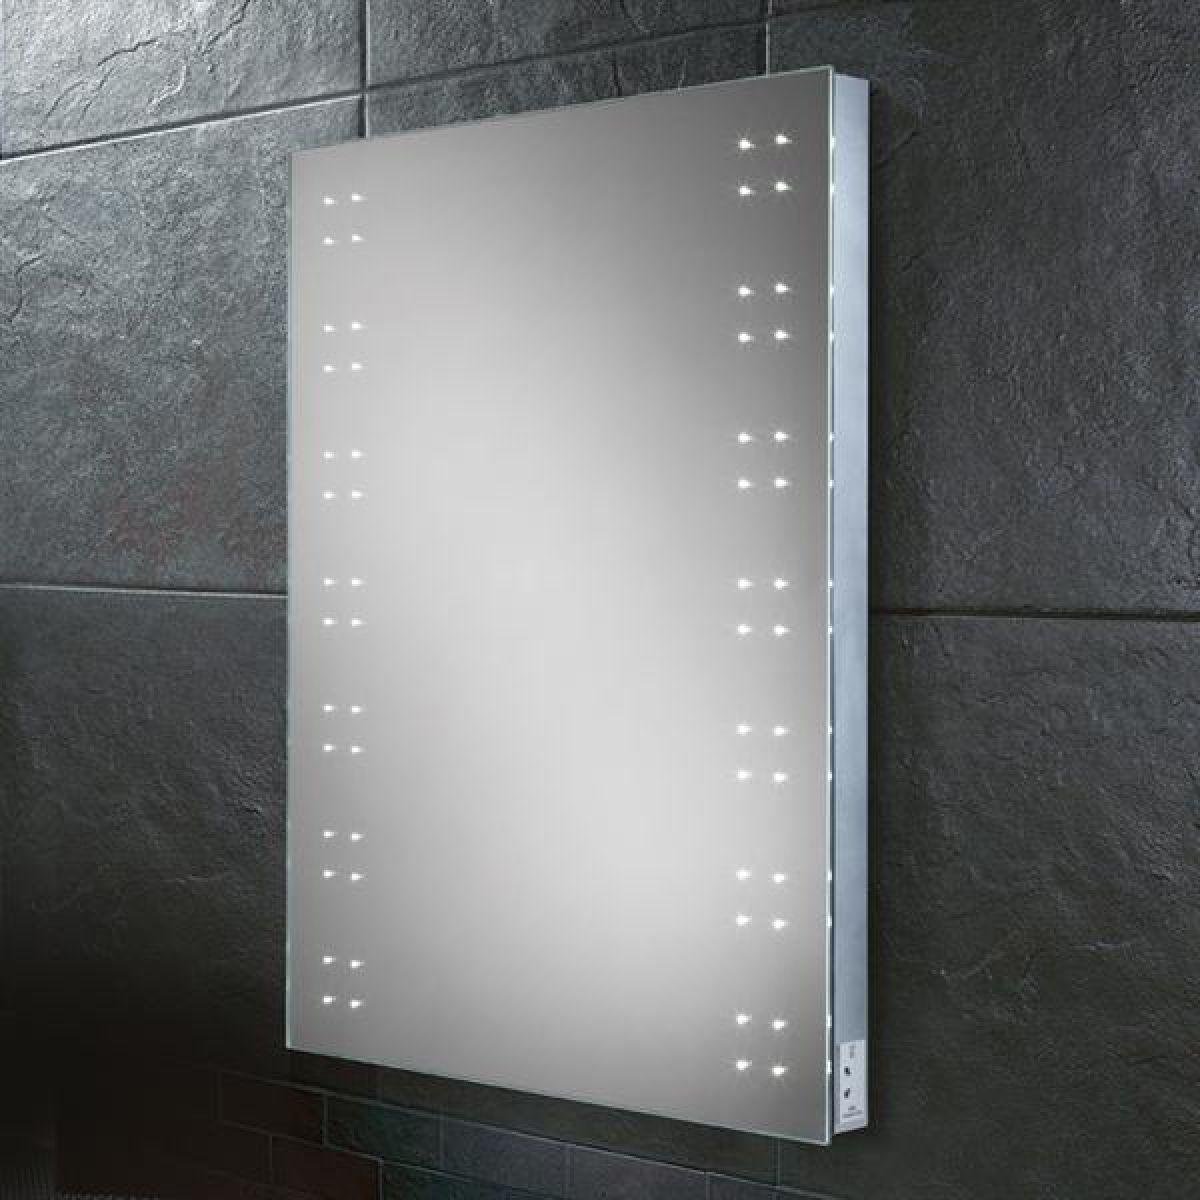 HiB Ariel Illuminated Bathroom Mirror